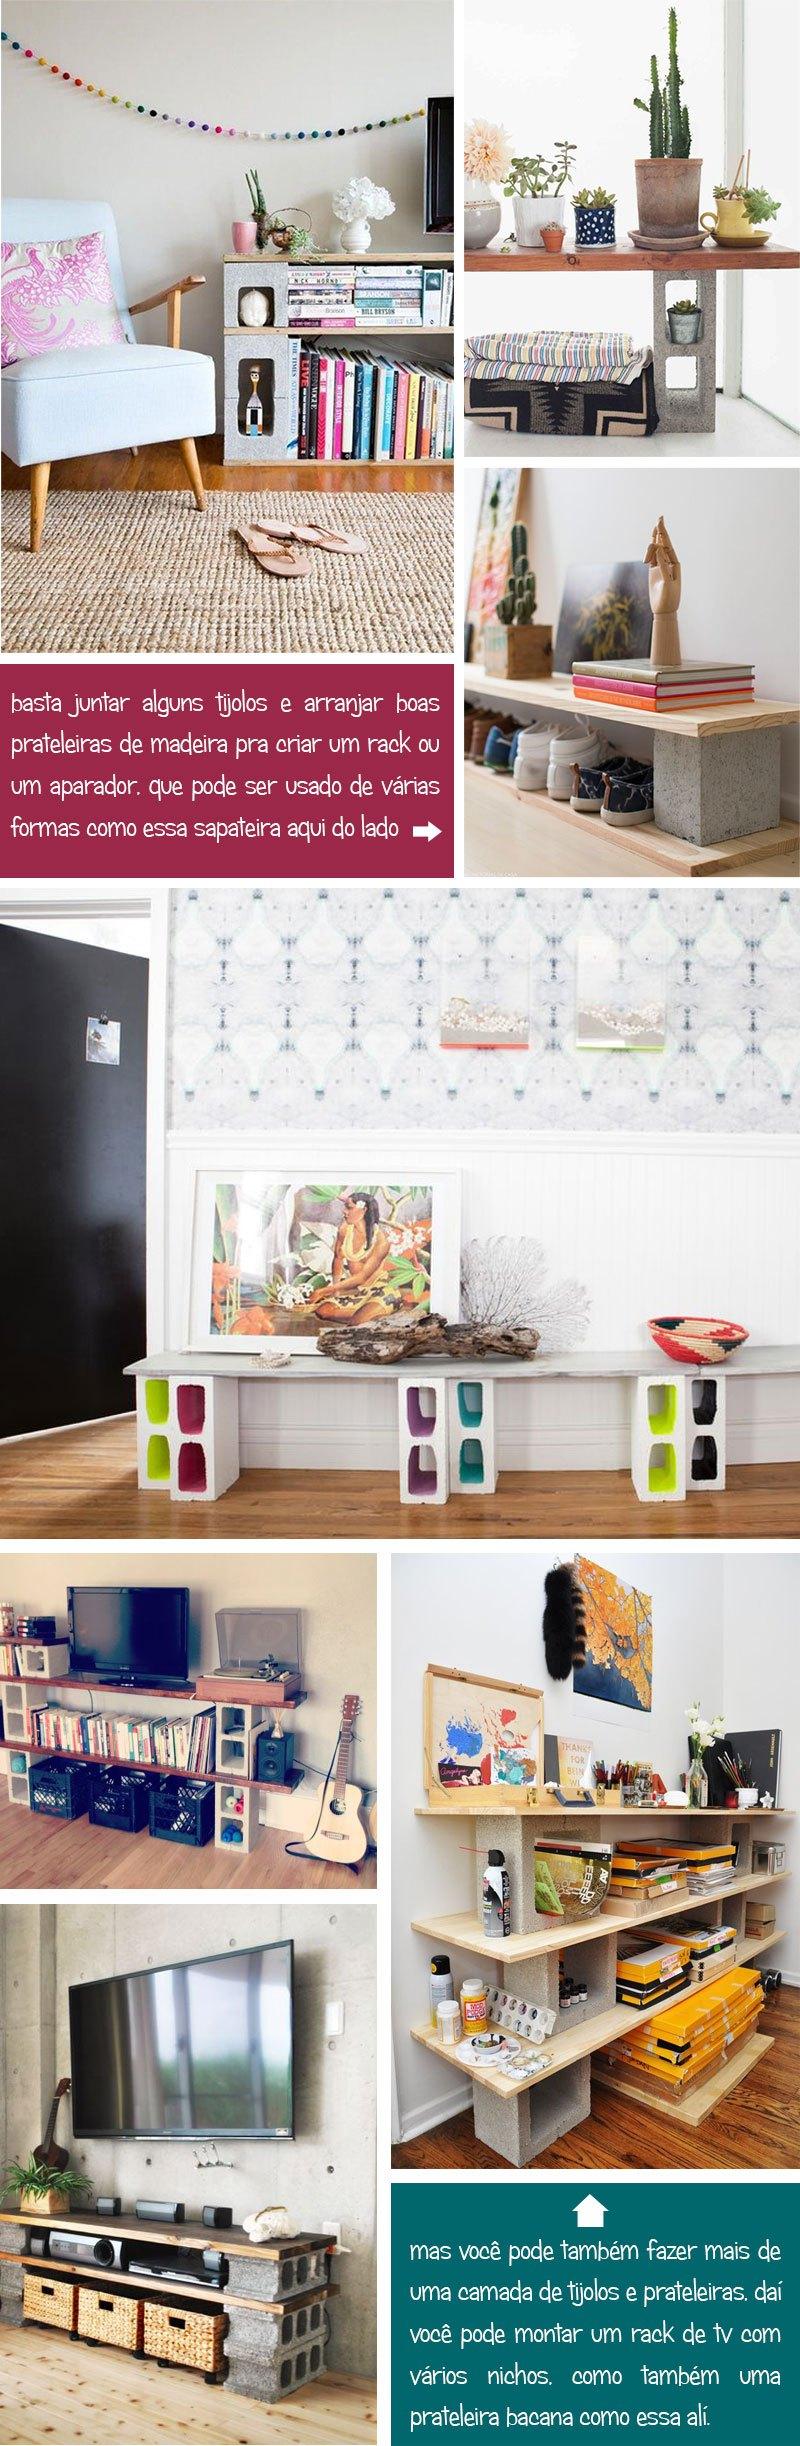 Chocolate Notebooks Cadernos Artesanais Cinder Block Furniture  -> Sala De Tv Improvisada